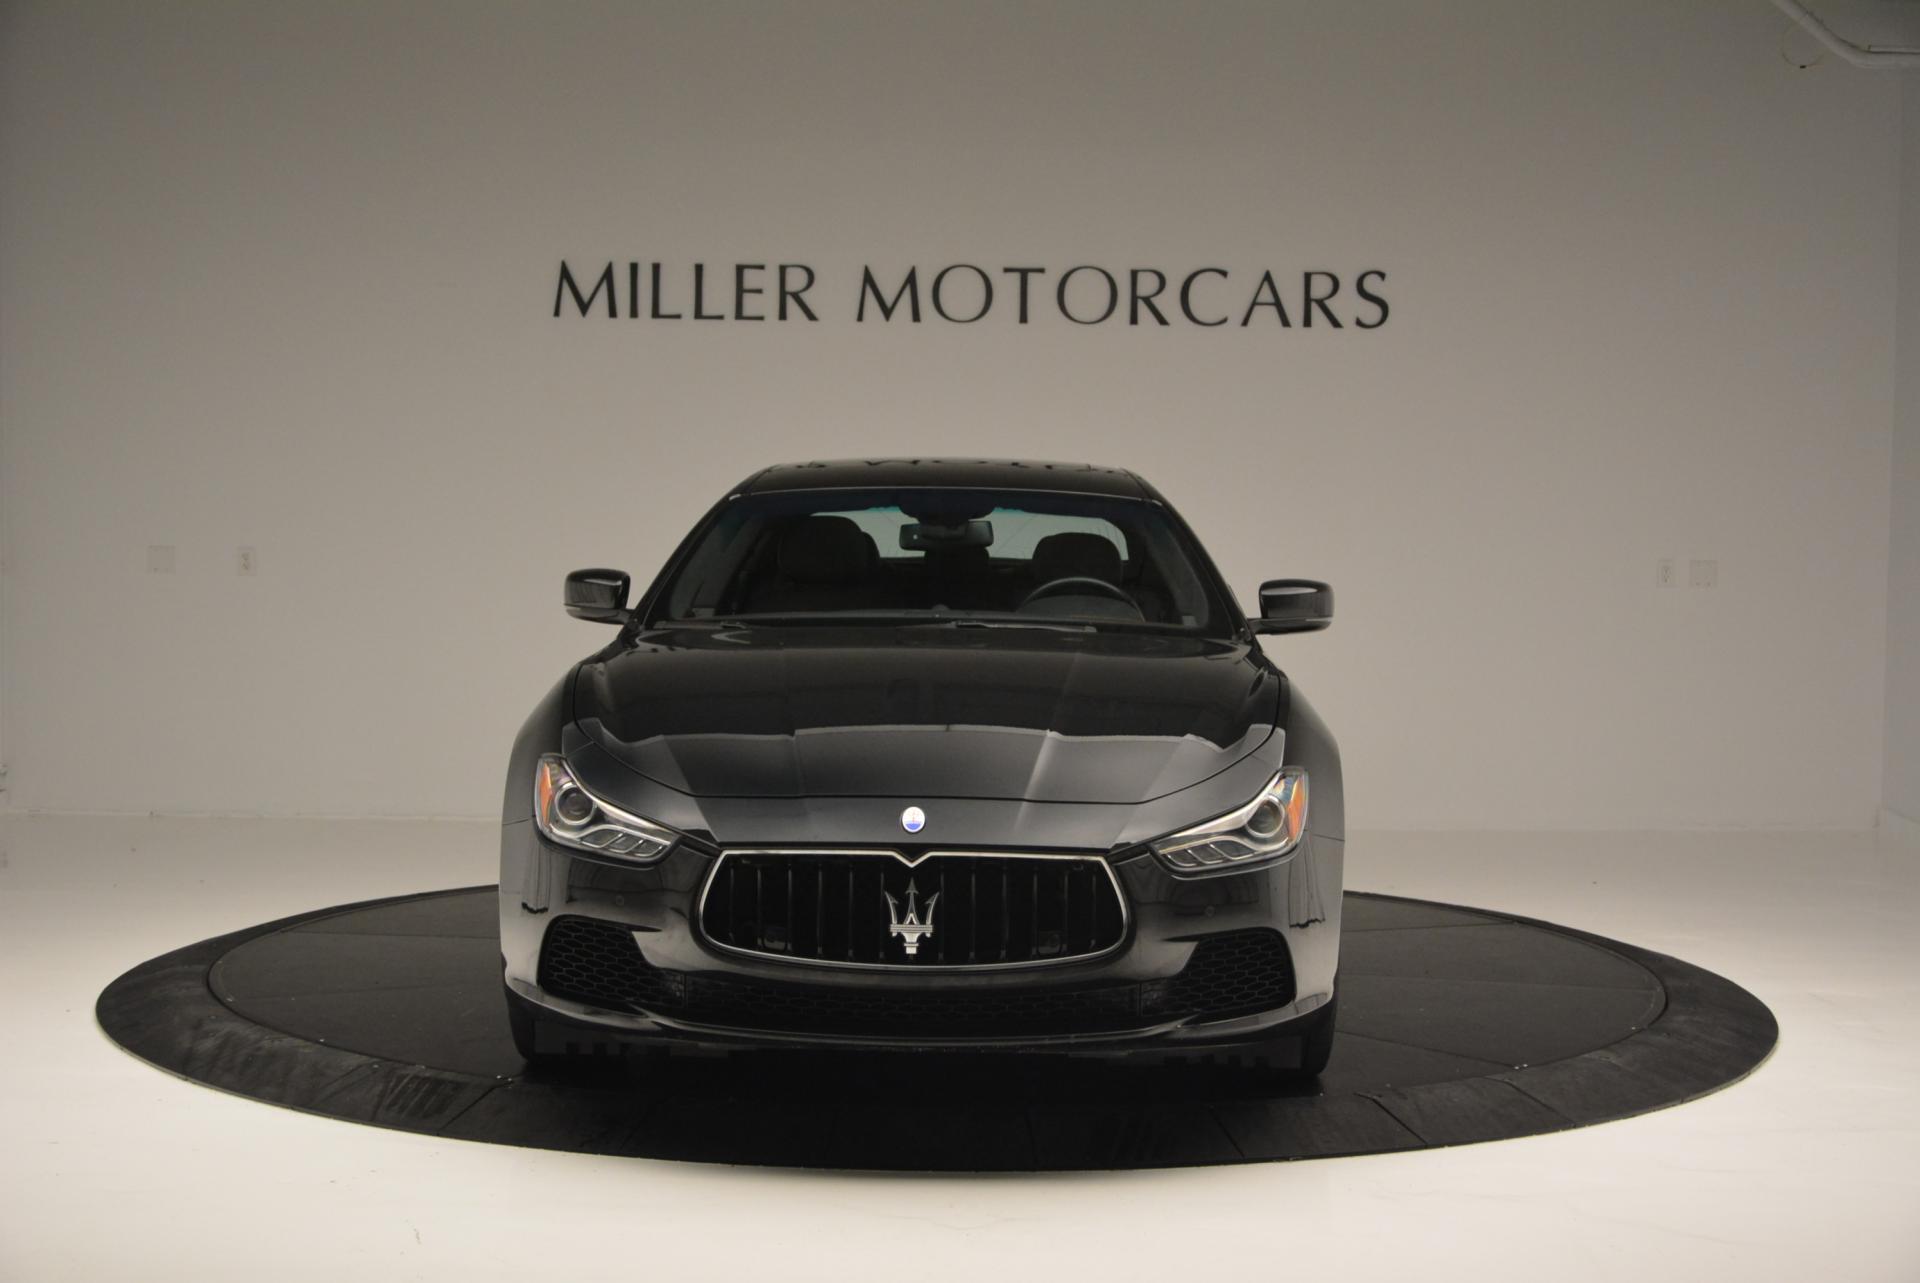 Used 2015 Maserati Ghibli S Q4 For Sale In Greenwich, CT 117_p11